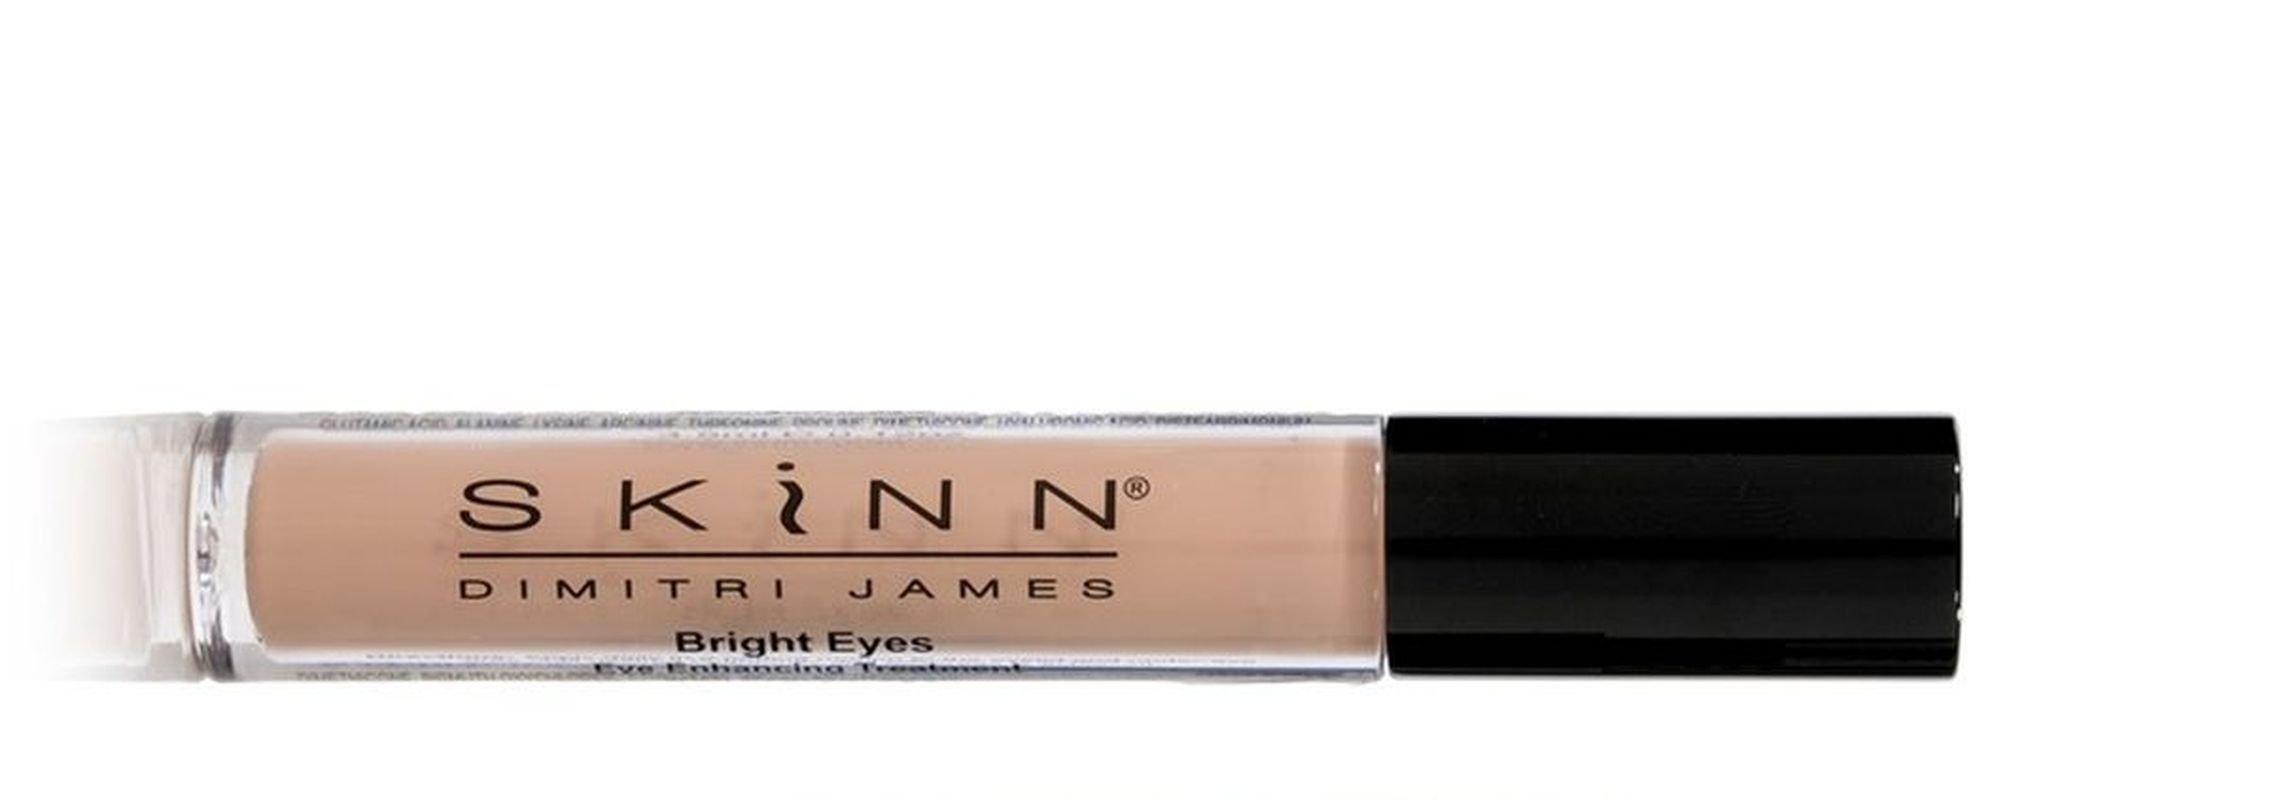 Skinn Cosmetics Bright Eyes Eye Enhancing Treatment-Tube - 0.12 oz by Skinn Cosmetics By: Dimitri James